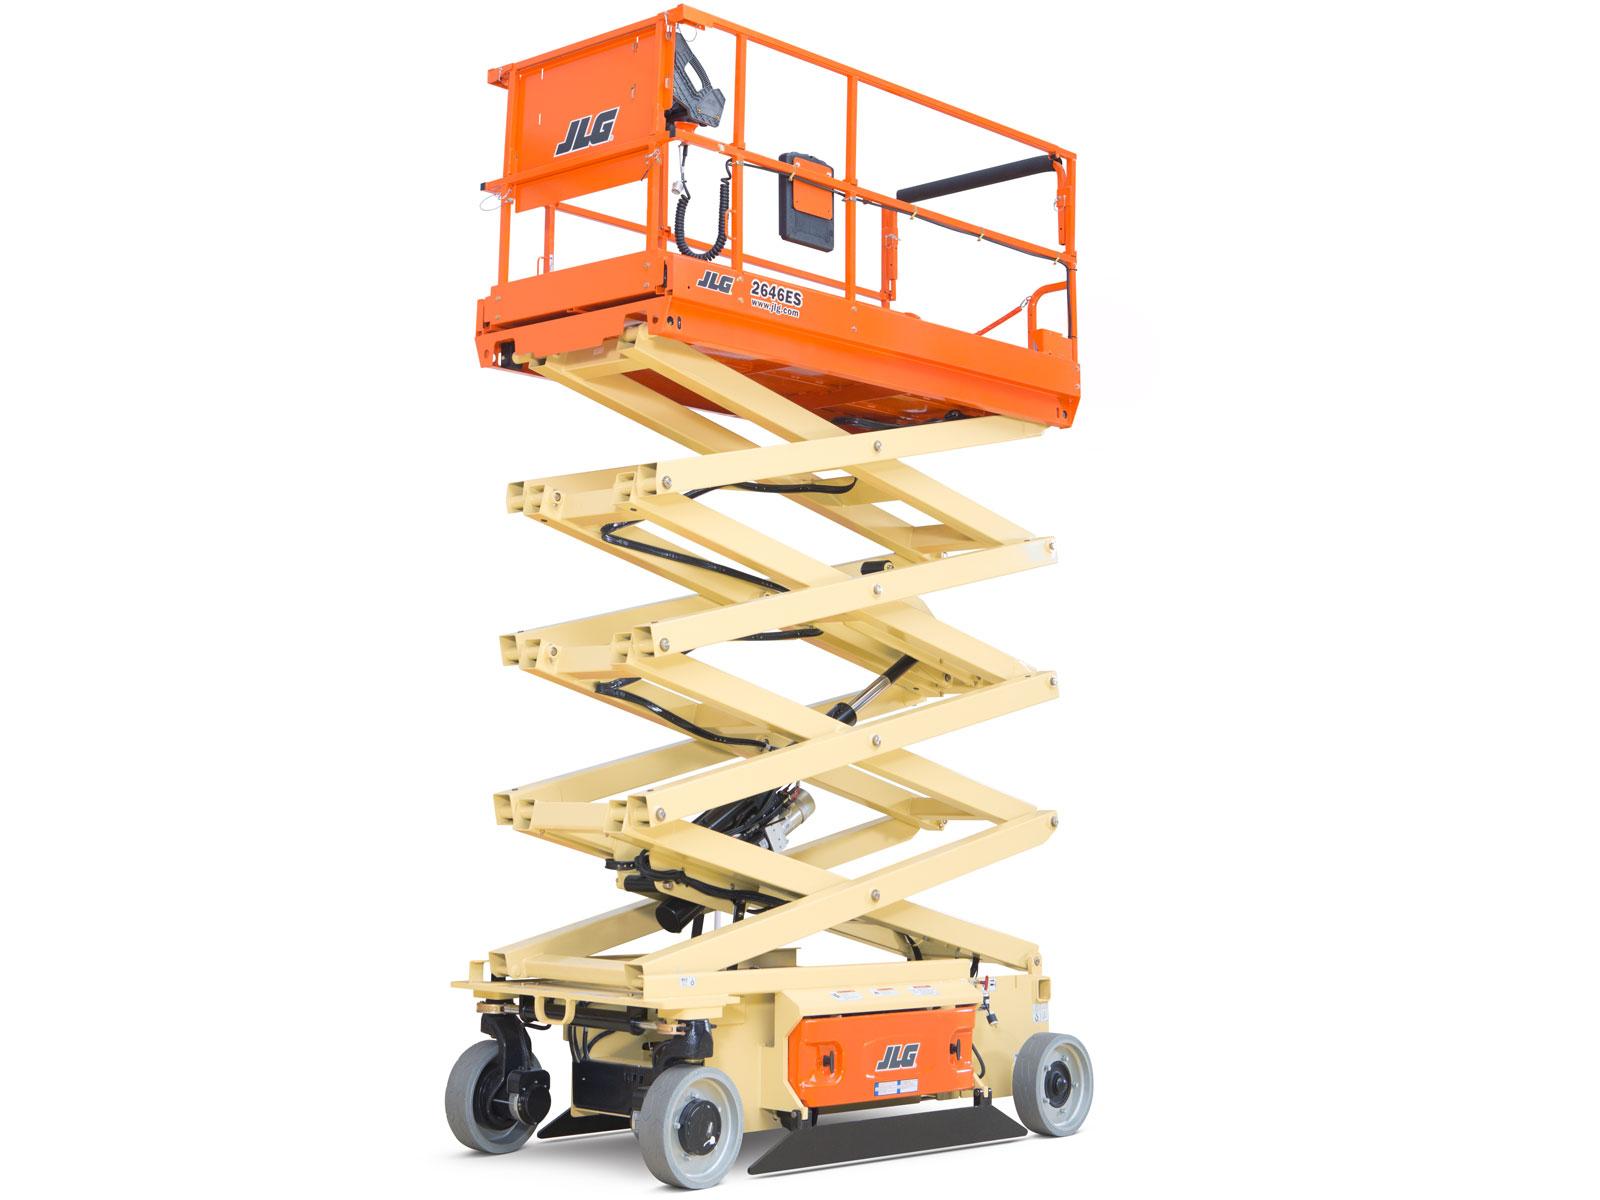 26 ft scissor lift